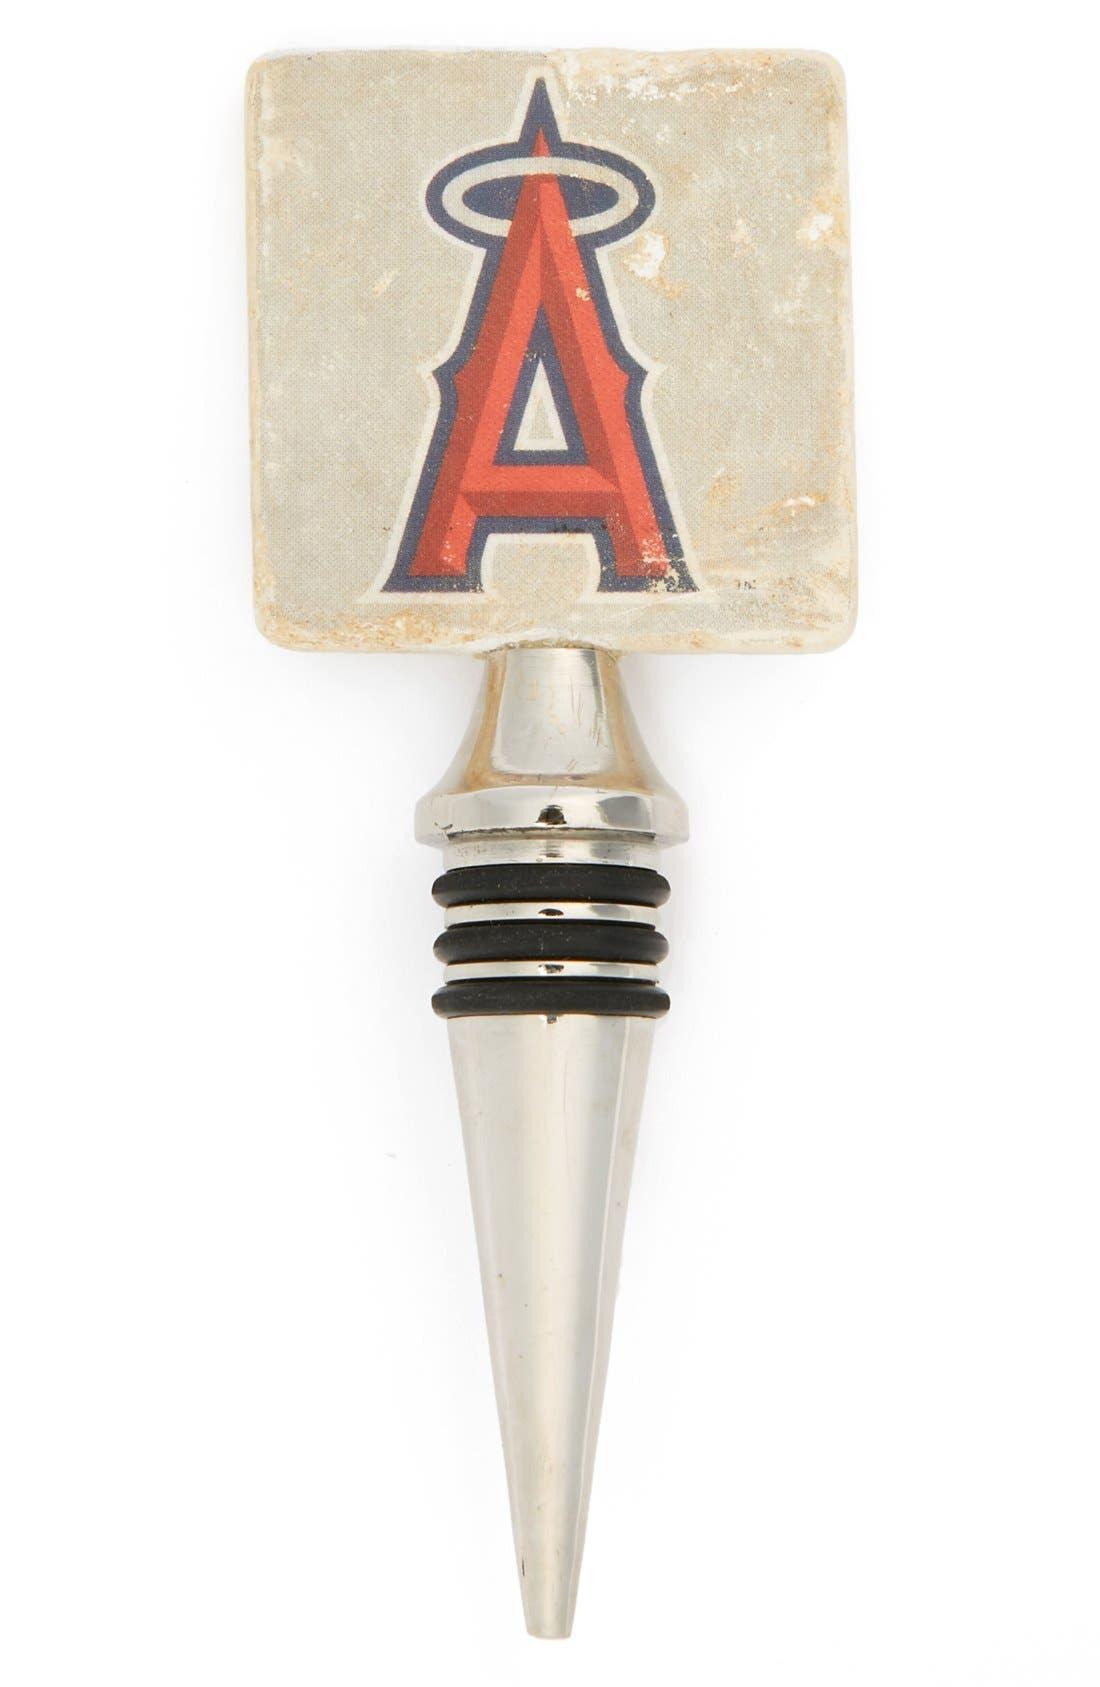 Alternate Image 1 Selected - Studio Vertu 'Anaheim Angels' Wine Stopper